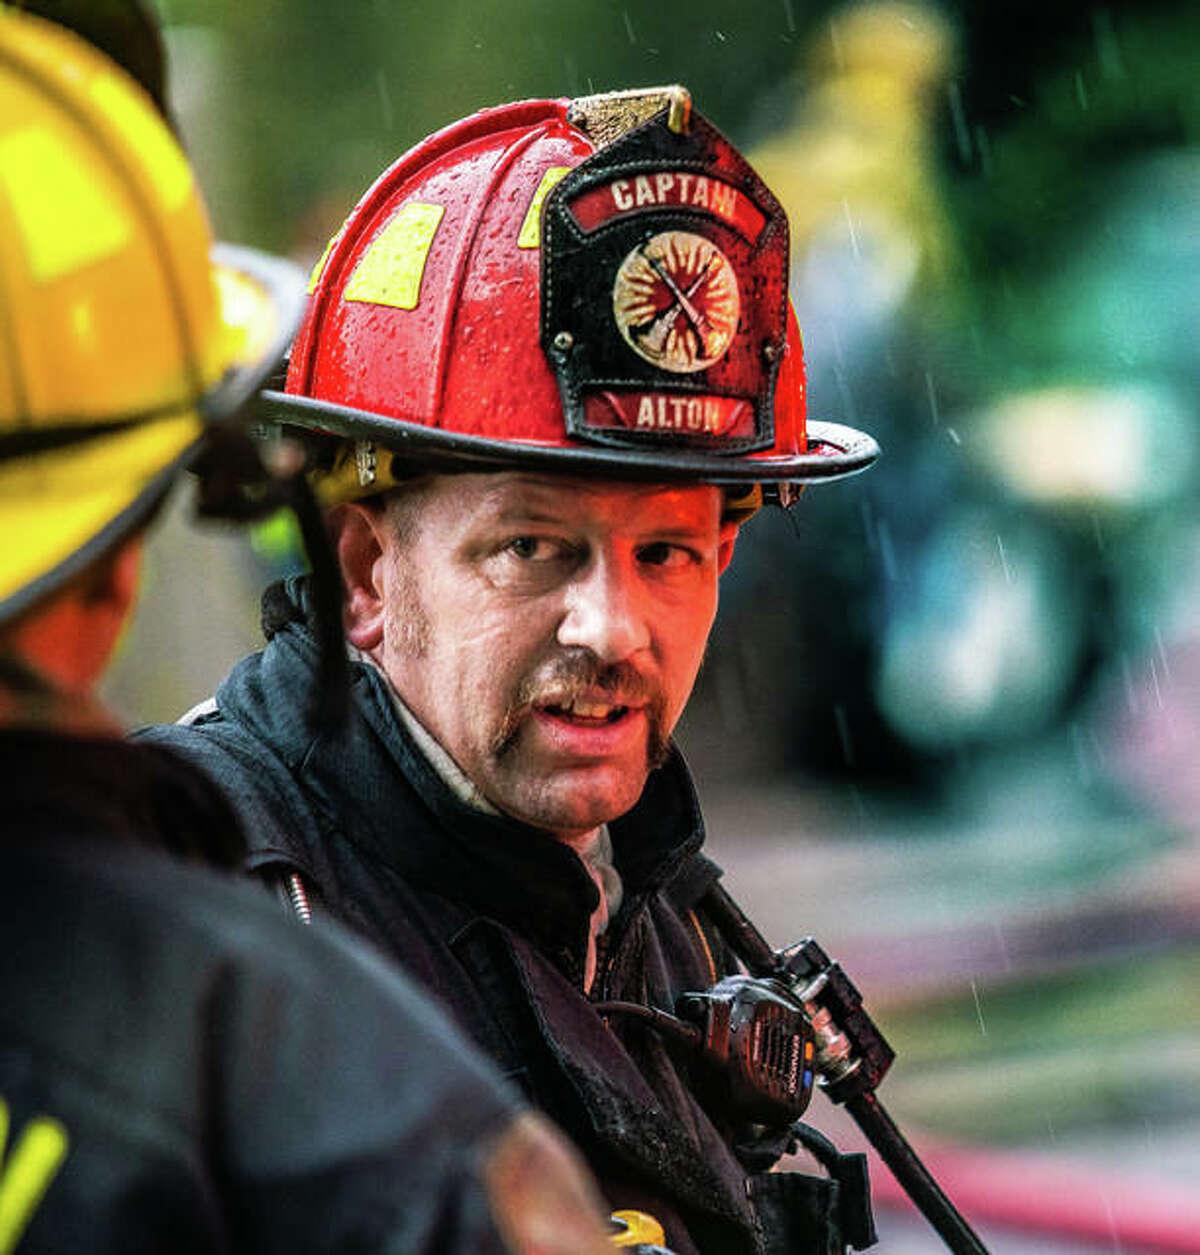 Alton Fire Captain Dan Whiteside speaks with a colleague as a heavy rain falls Friday during a fire call on Hampton Street in Alton.